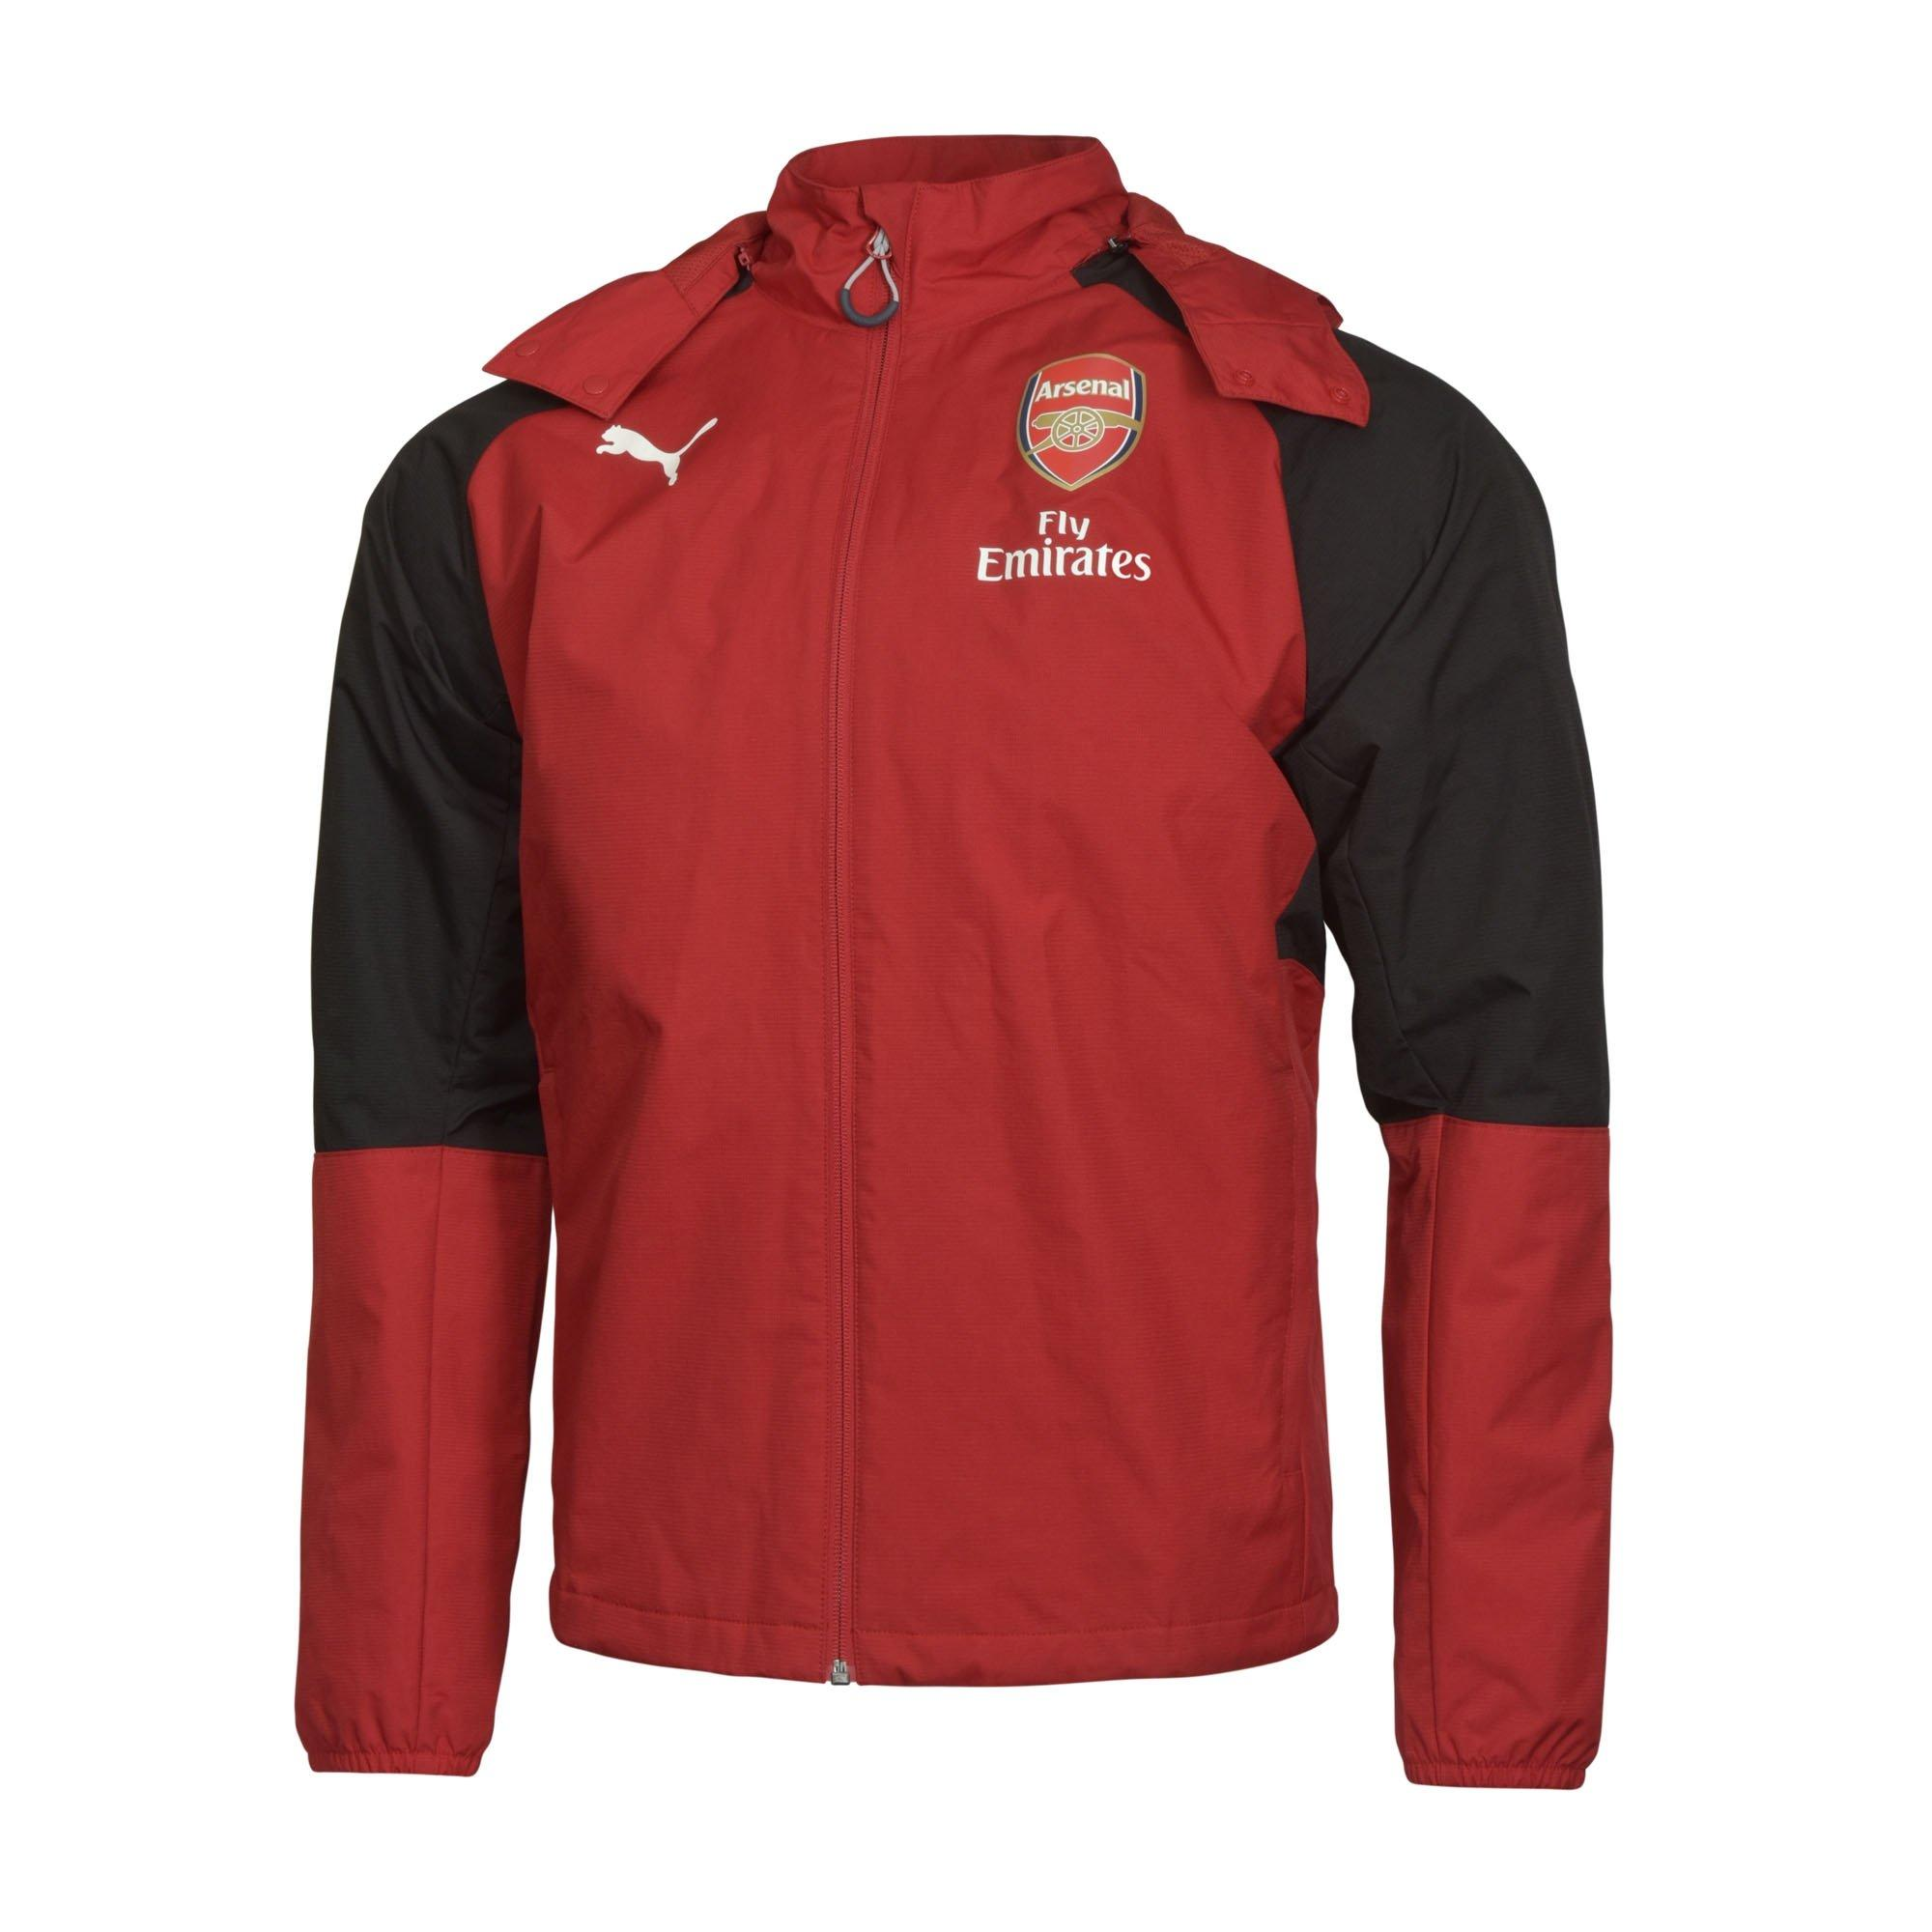 Arsenal Adult 17/18 Red Performance Rain Jacket